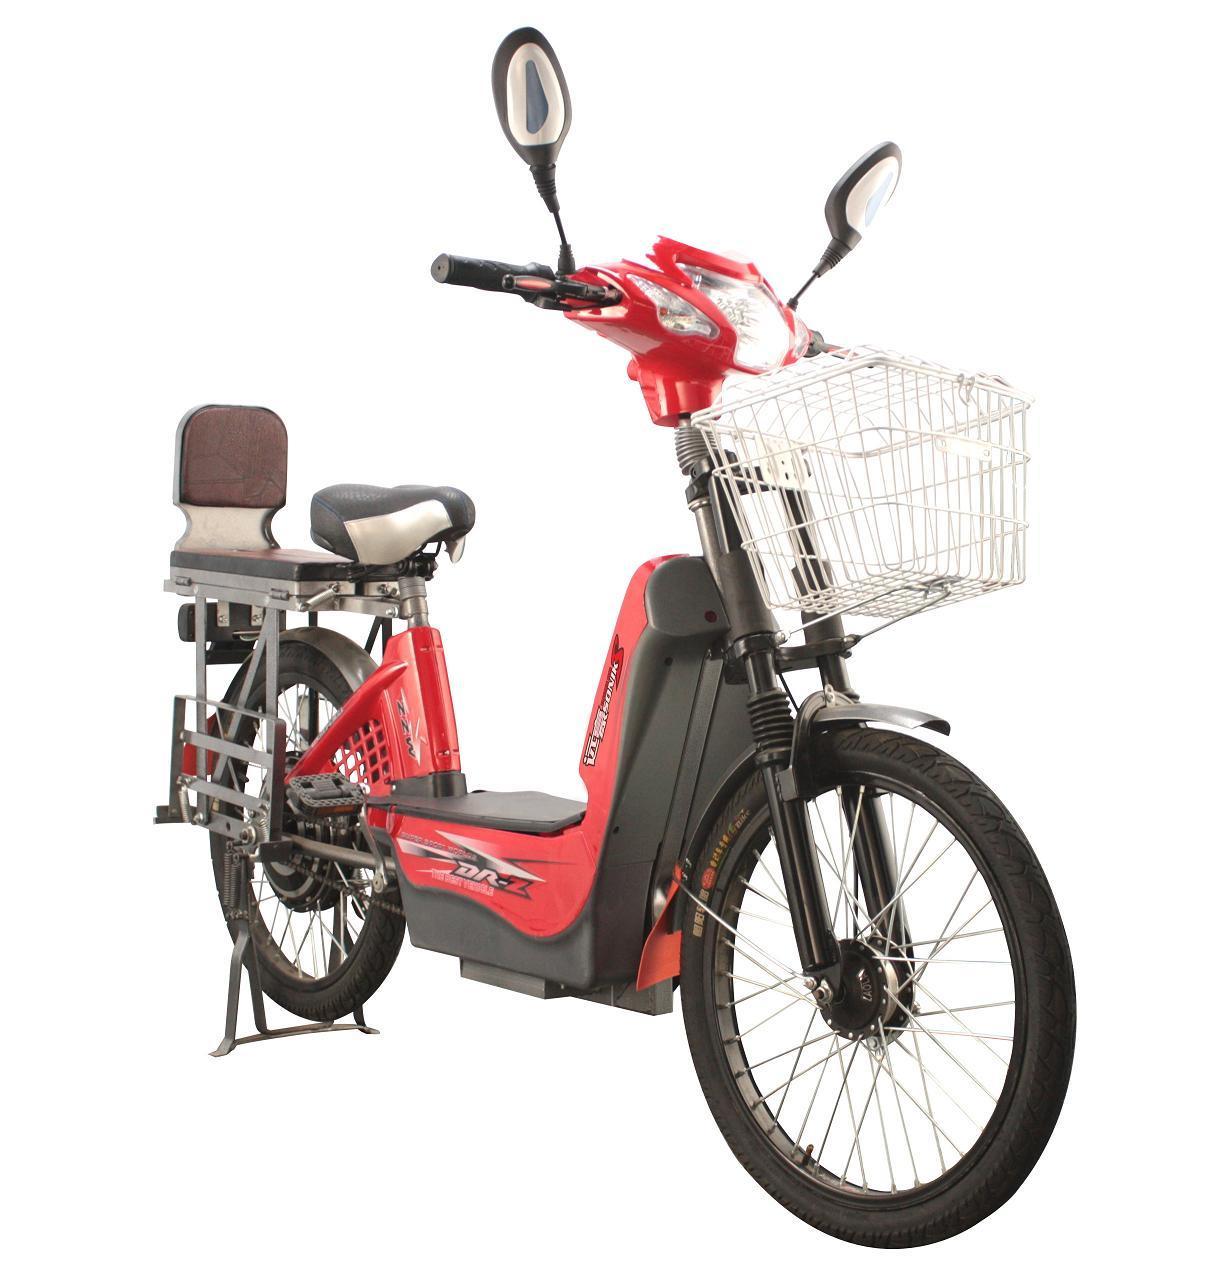 Kings Electric Motorbike Best Secret Wiring Diagram Chinese Vehicle Bike Load King Skb006 China Bikes